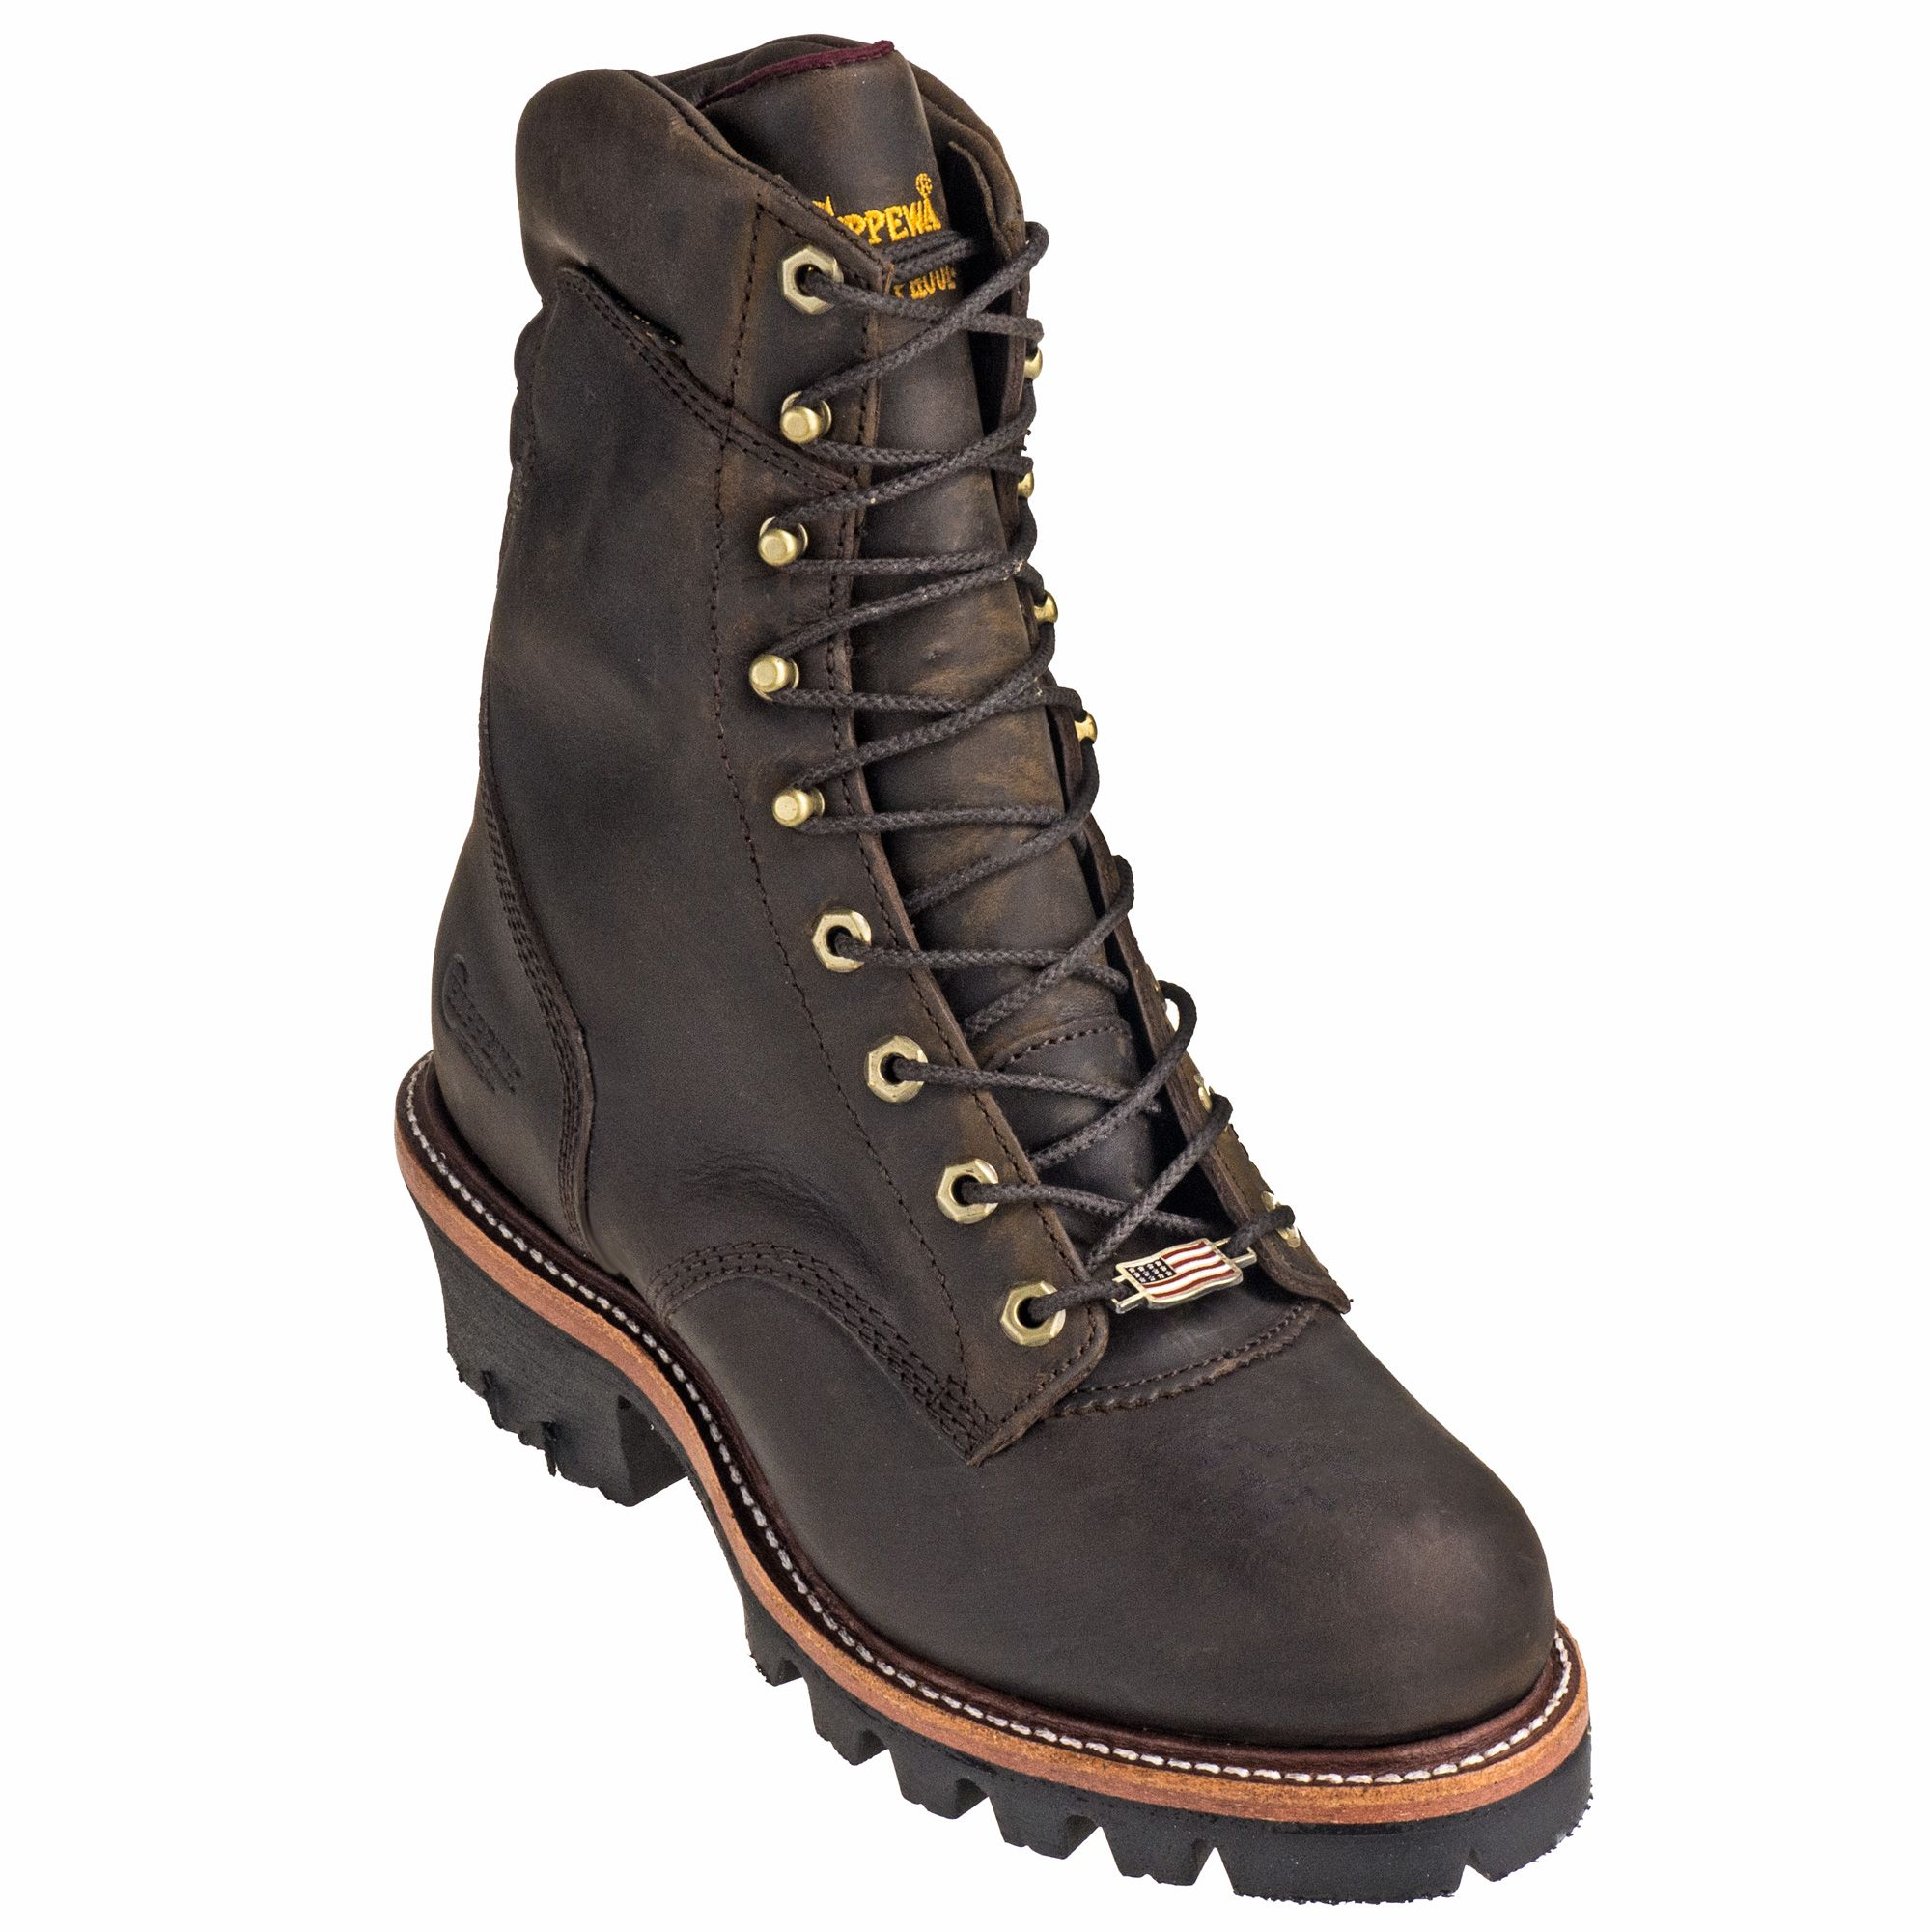 Chippewa Boots Men's Waterproof USAMade 25406 Logger